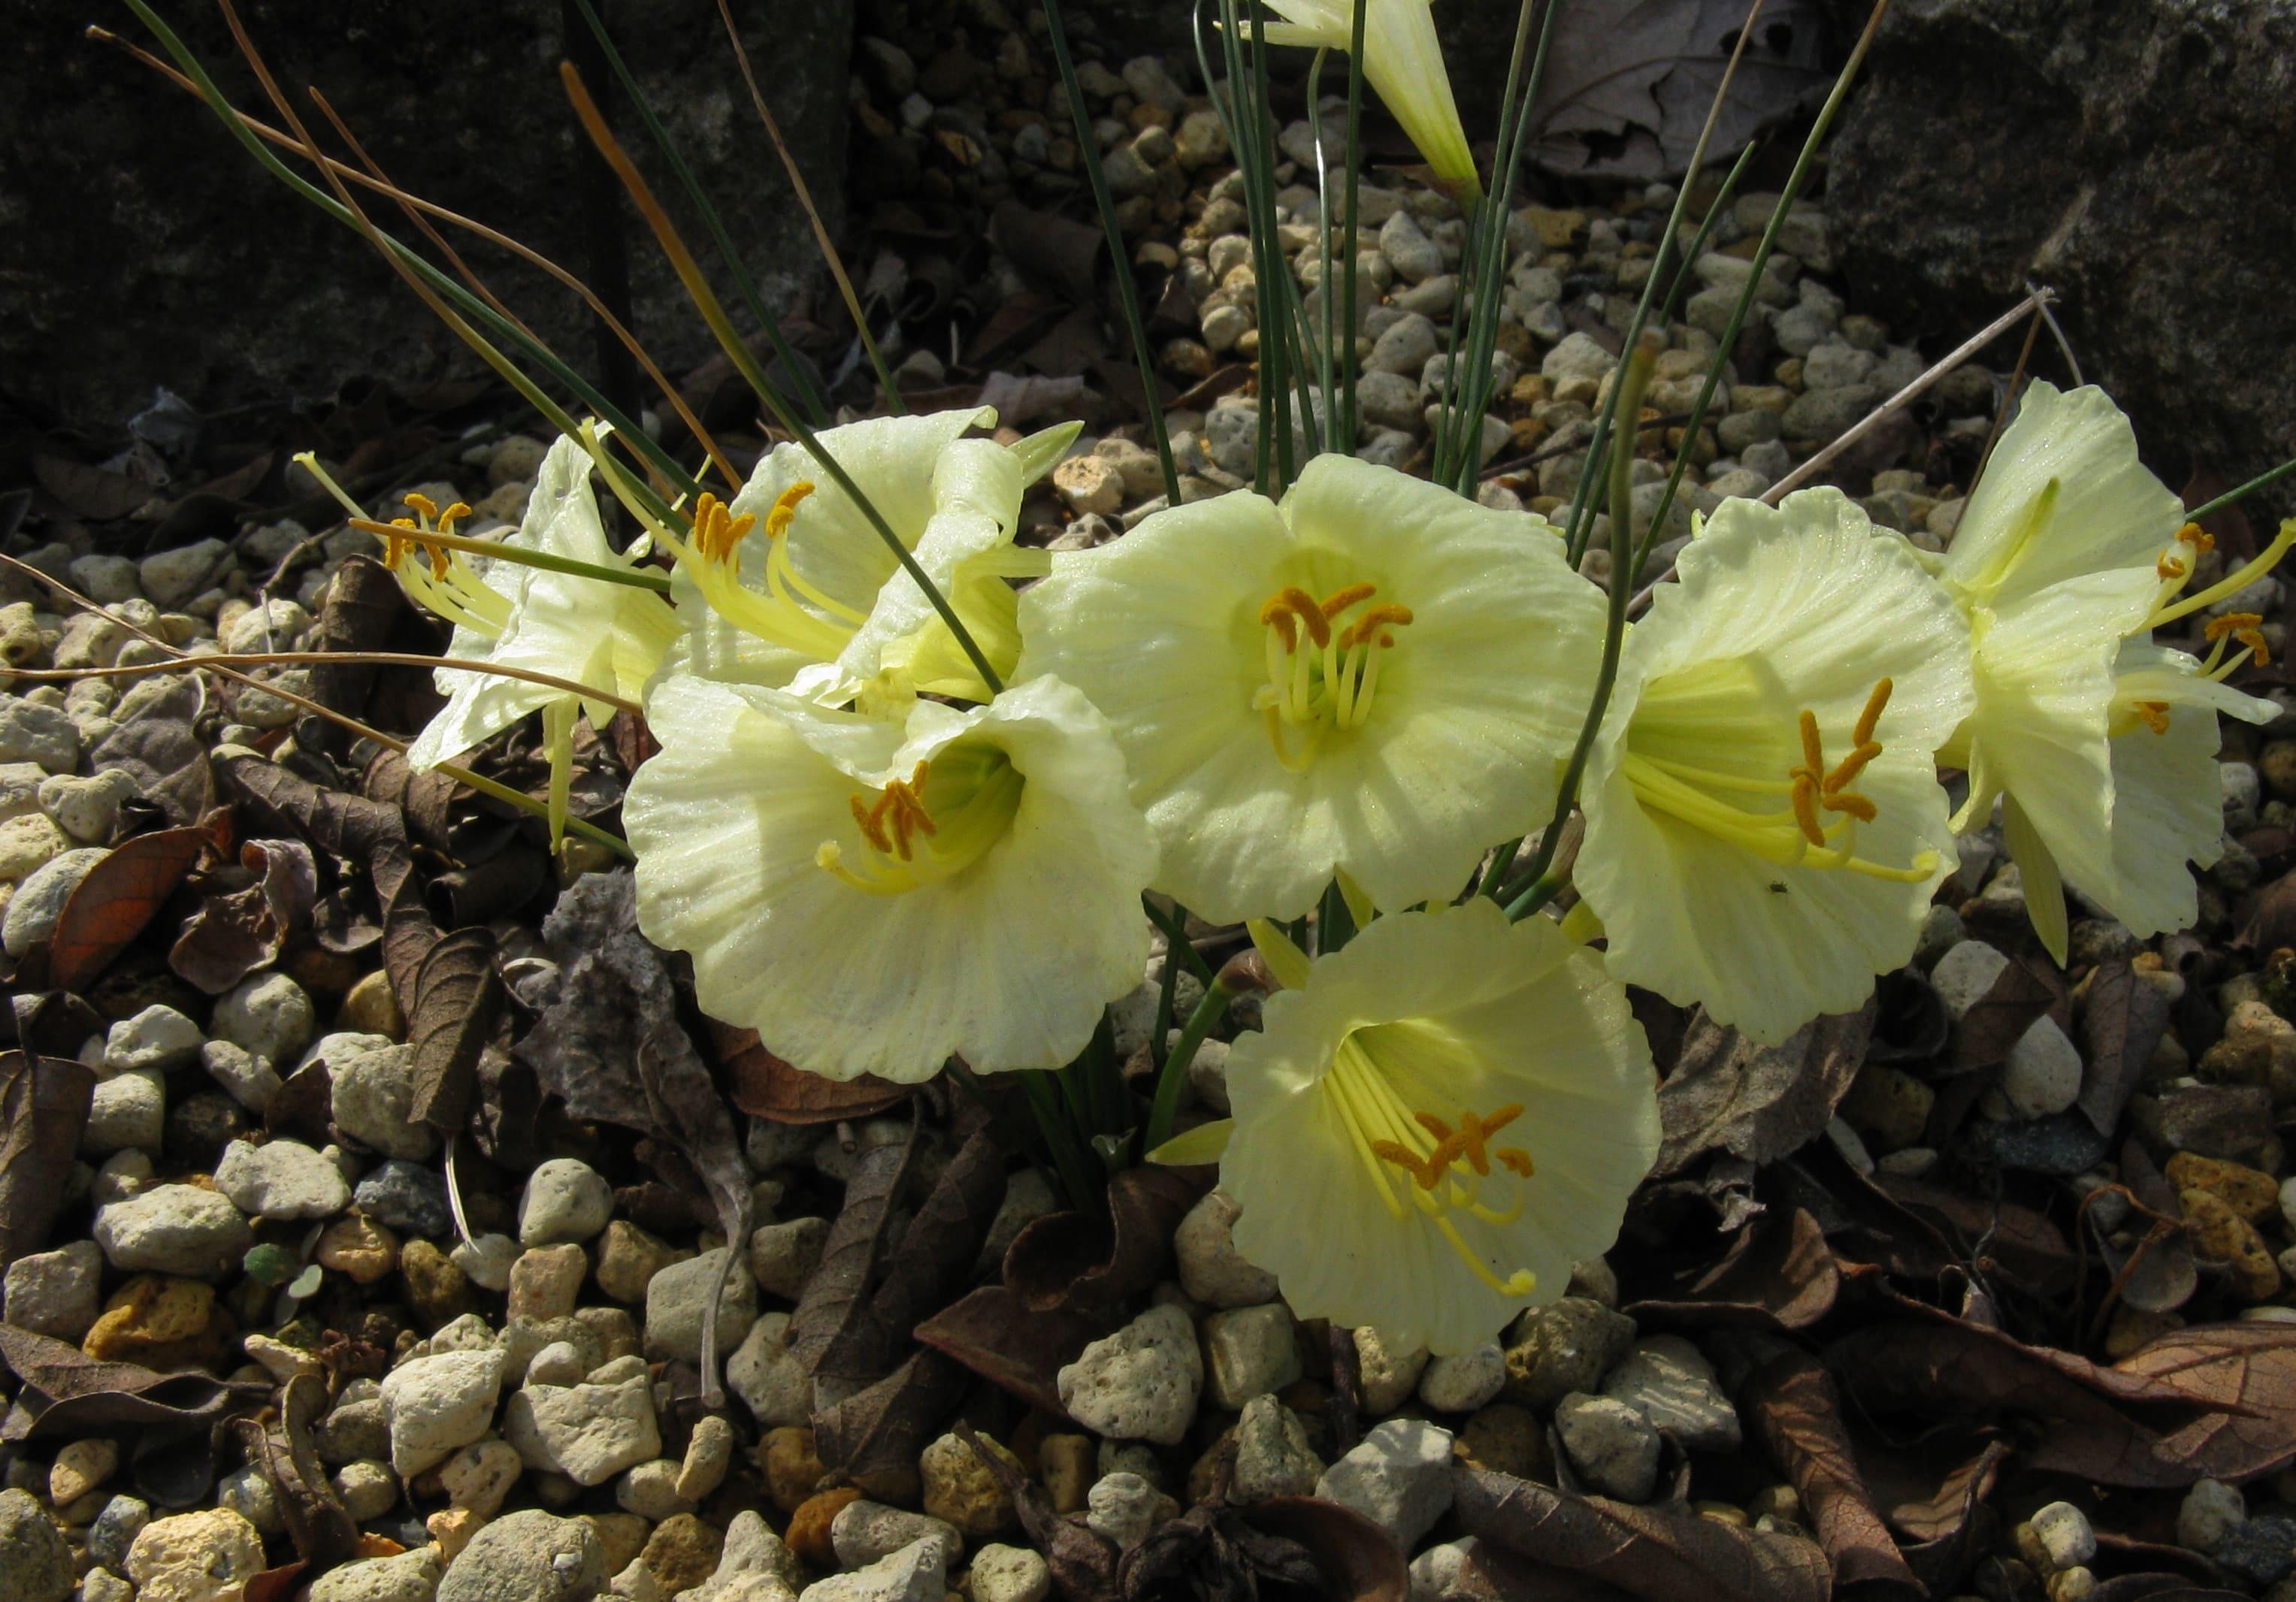 daffodils-photo-42